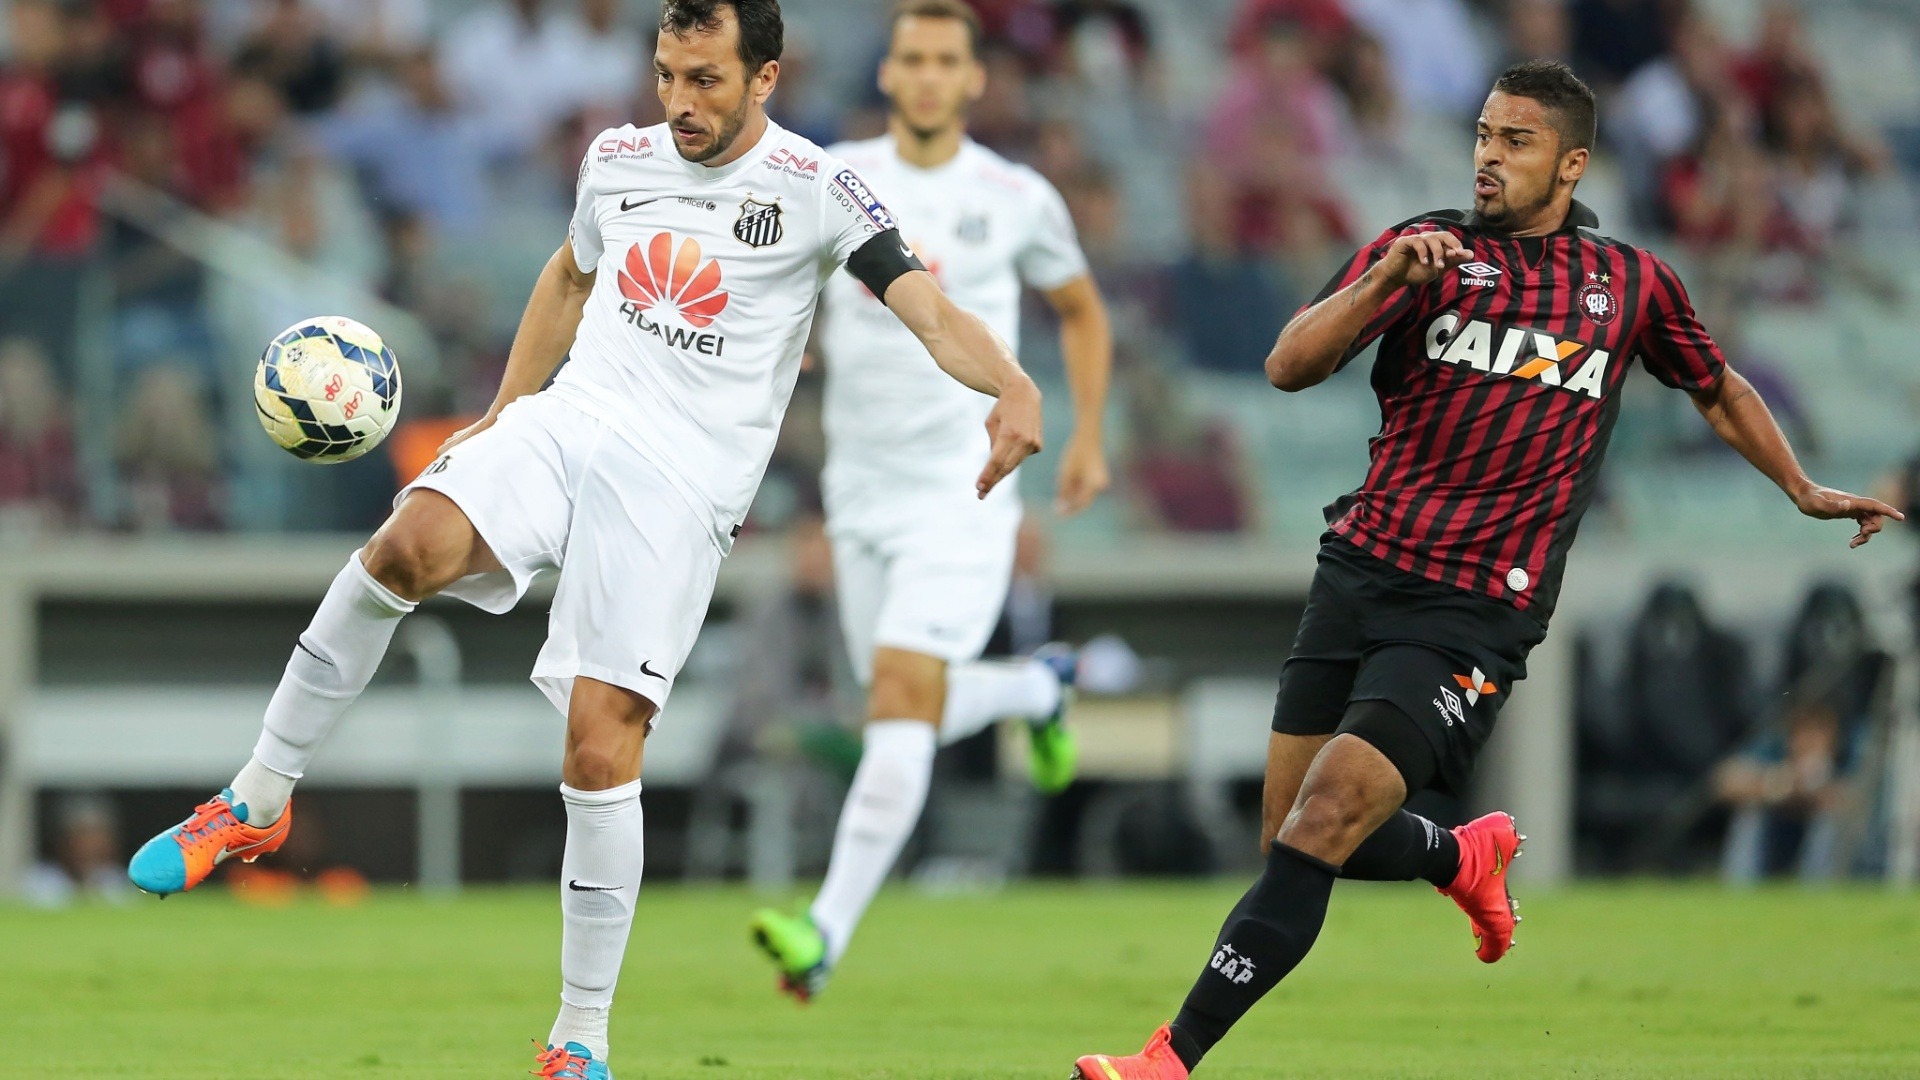 Edu Dracena, do Santos, tenta corte de bola cercado por Dellatorre, do Atlético-PR